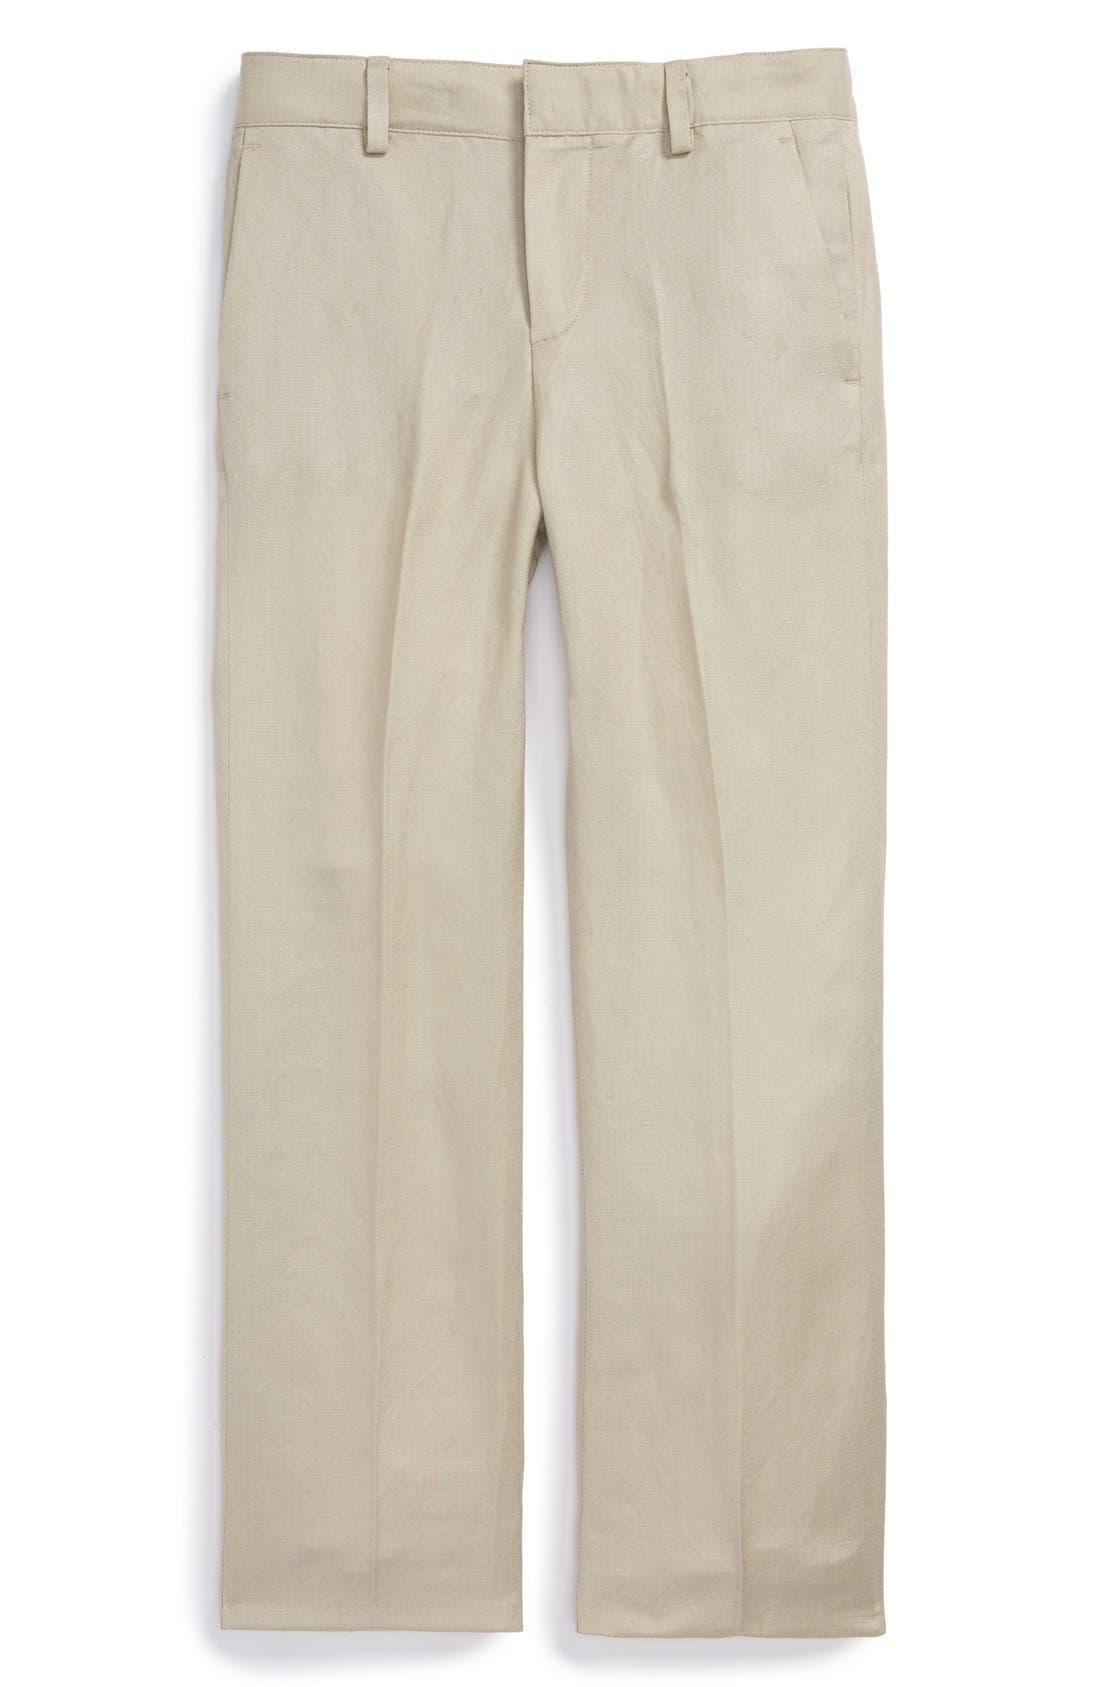 Alternate Image 1 Selected - Nordstrom 'Quentin' Linen Blend Trousers (Toddler Boys, Little Boys & Big Boys)